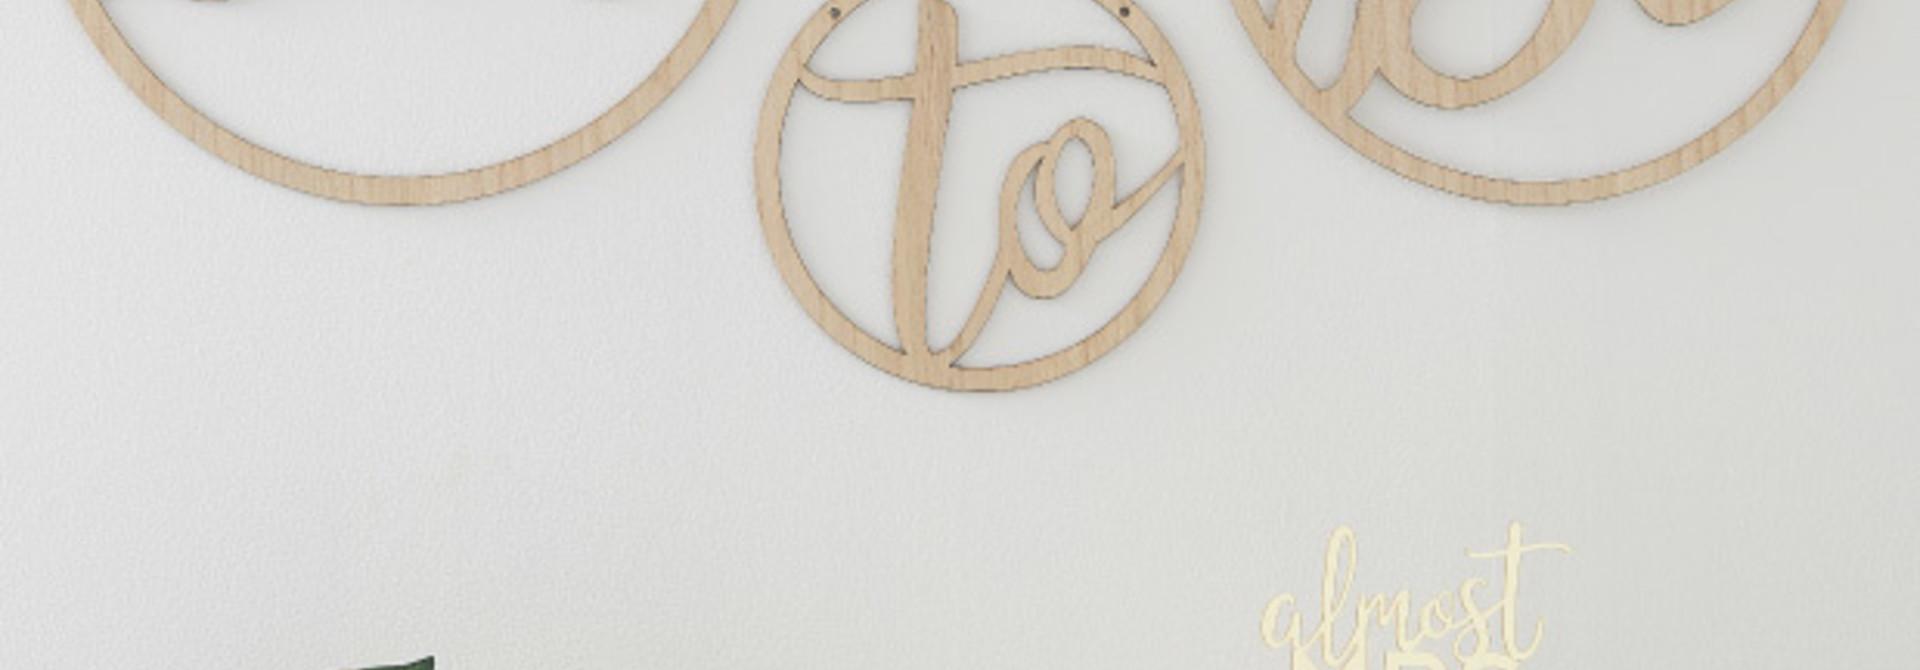 Houten hangers Bride To Be Botanical Hen (3st) Ginger Ray